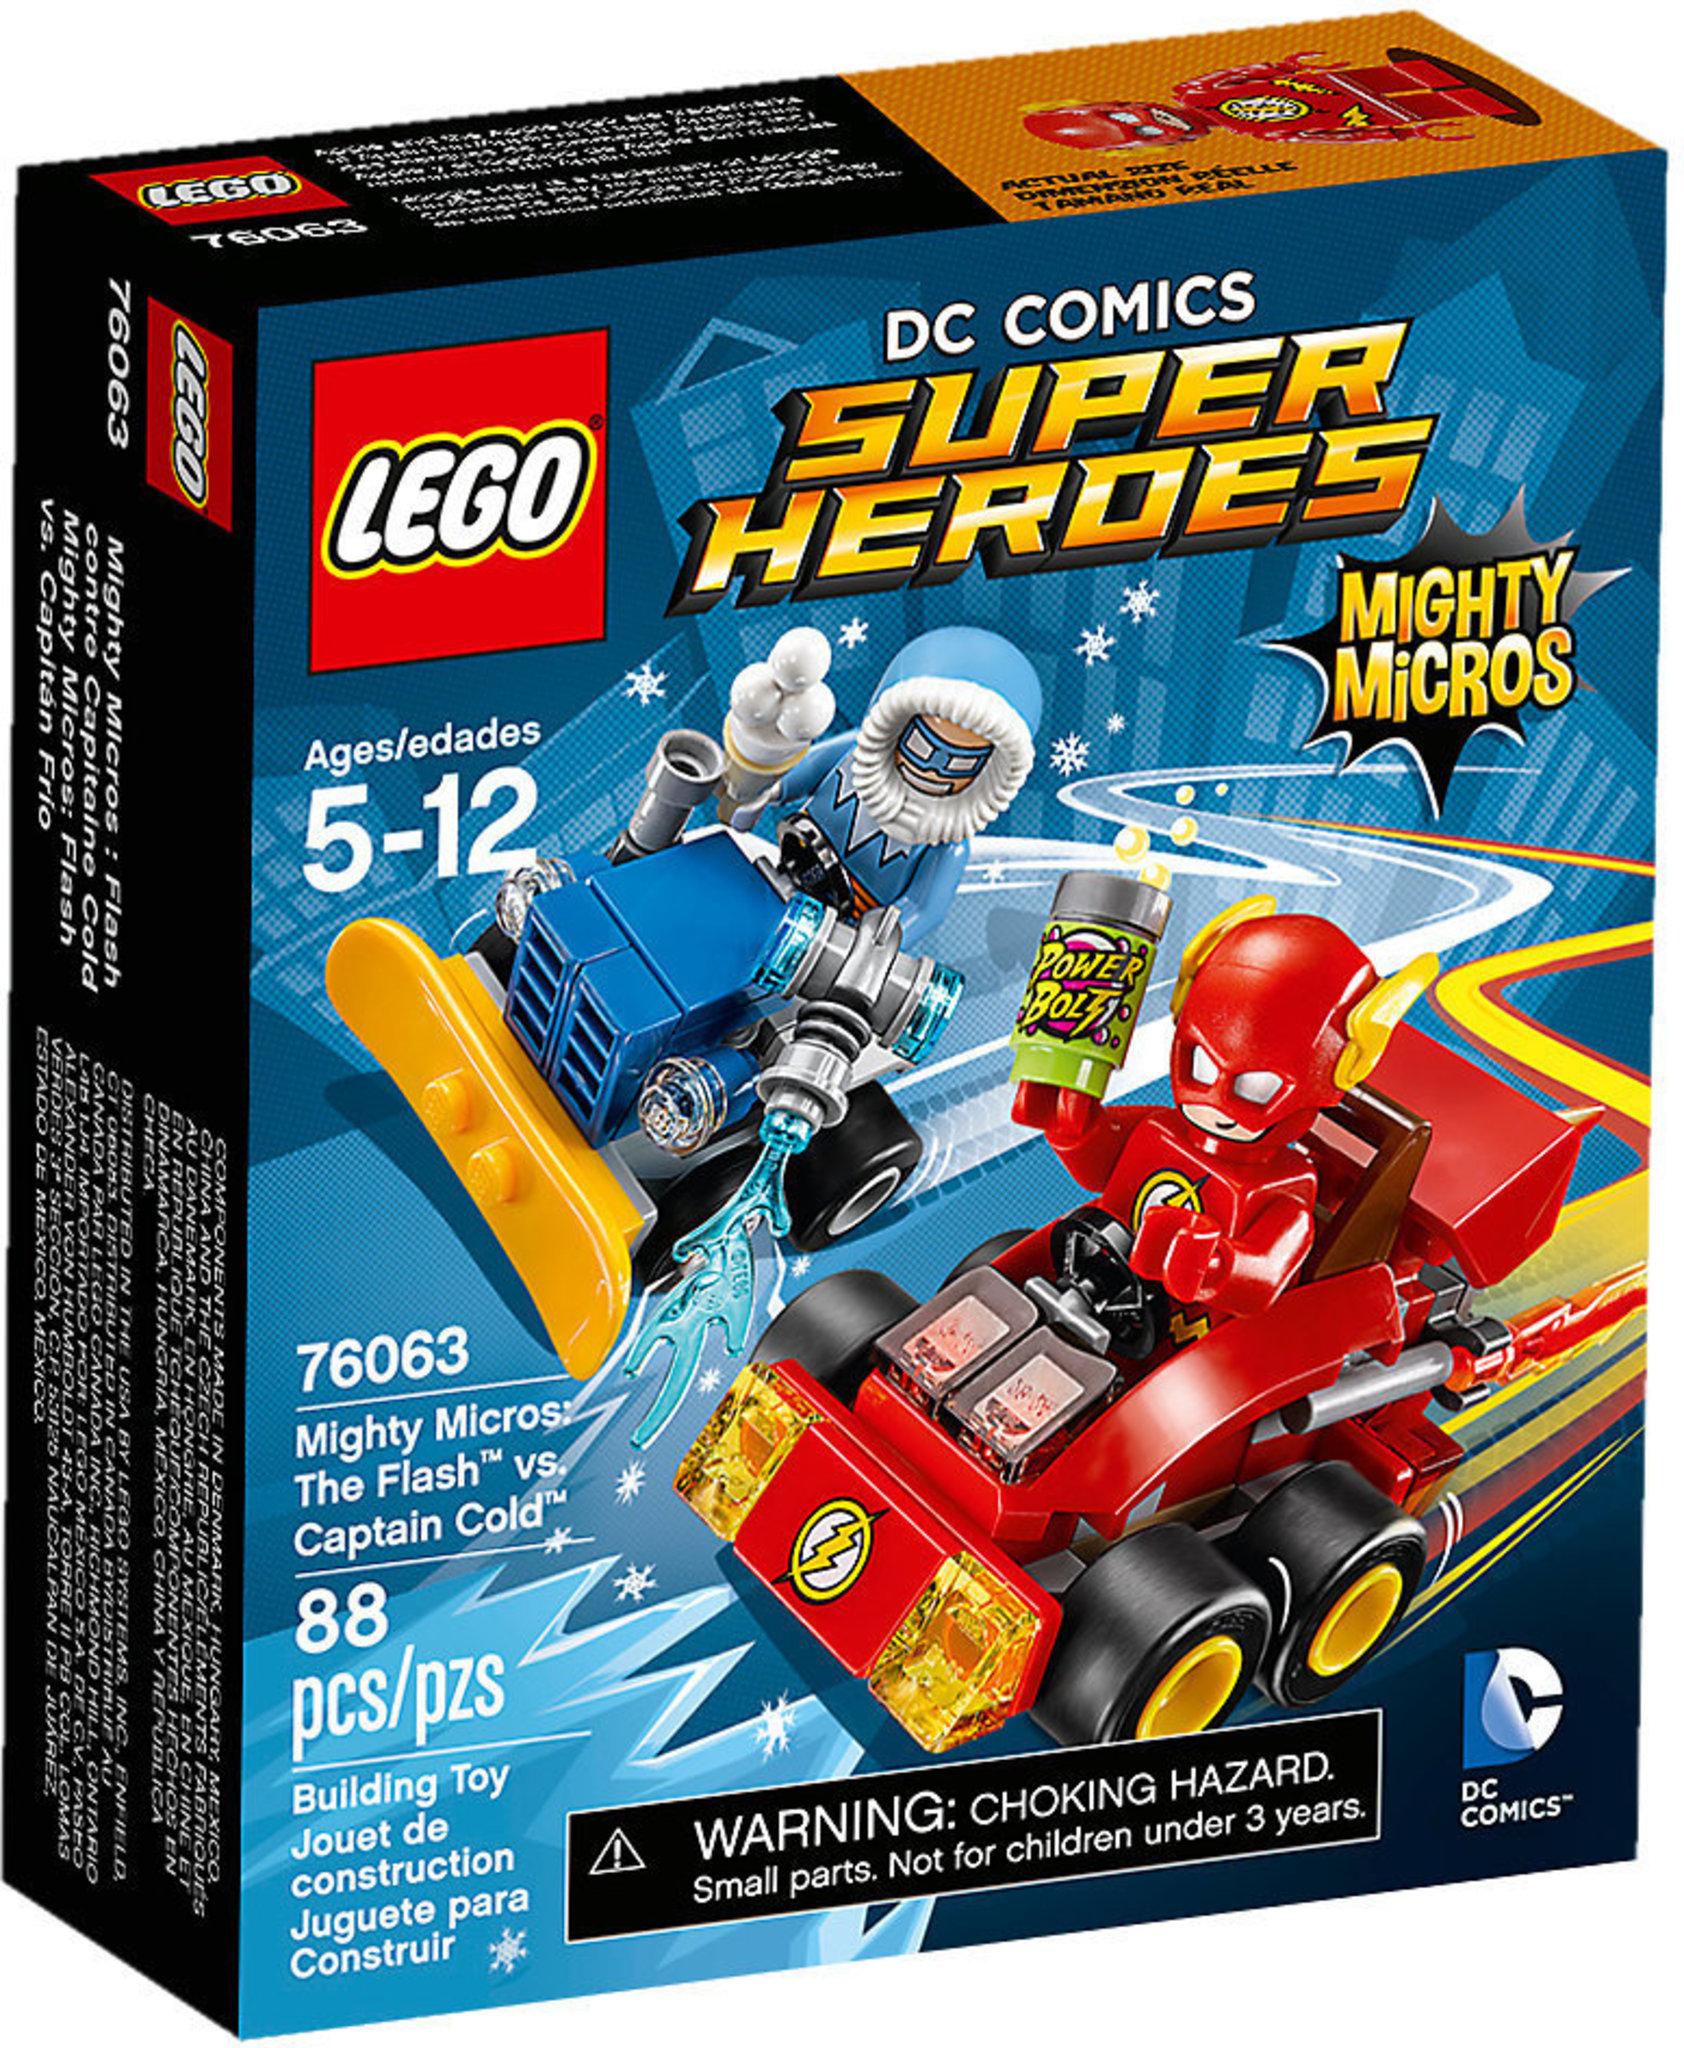 LEGO Minifigures LEGO 76069 Mighty Micros Batman Vs Killer Moth Set